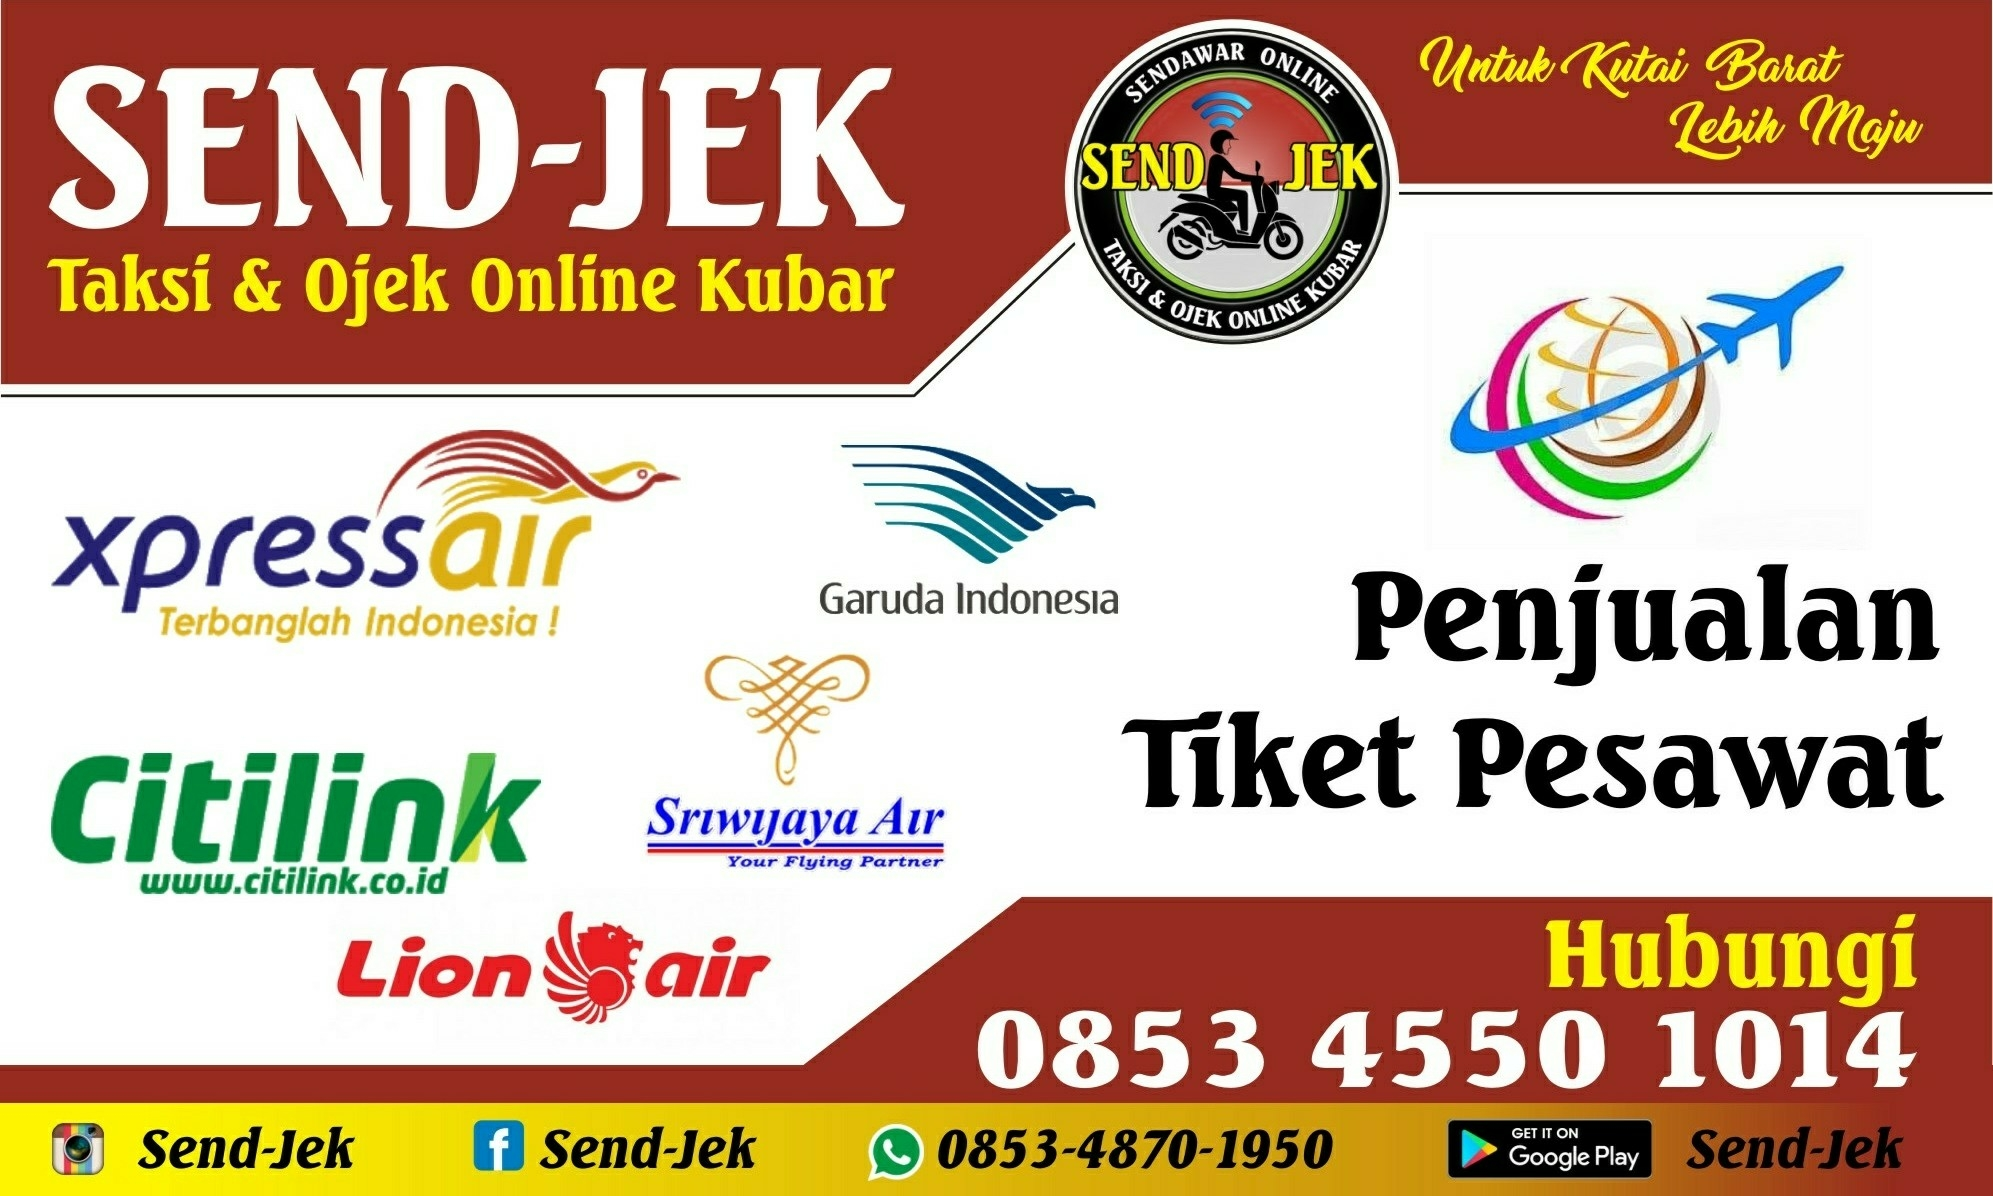 Send-Jek 5